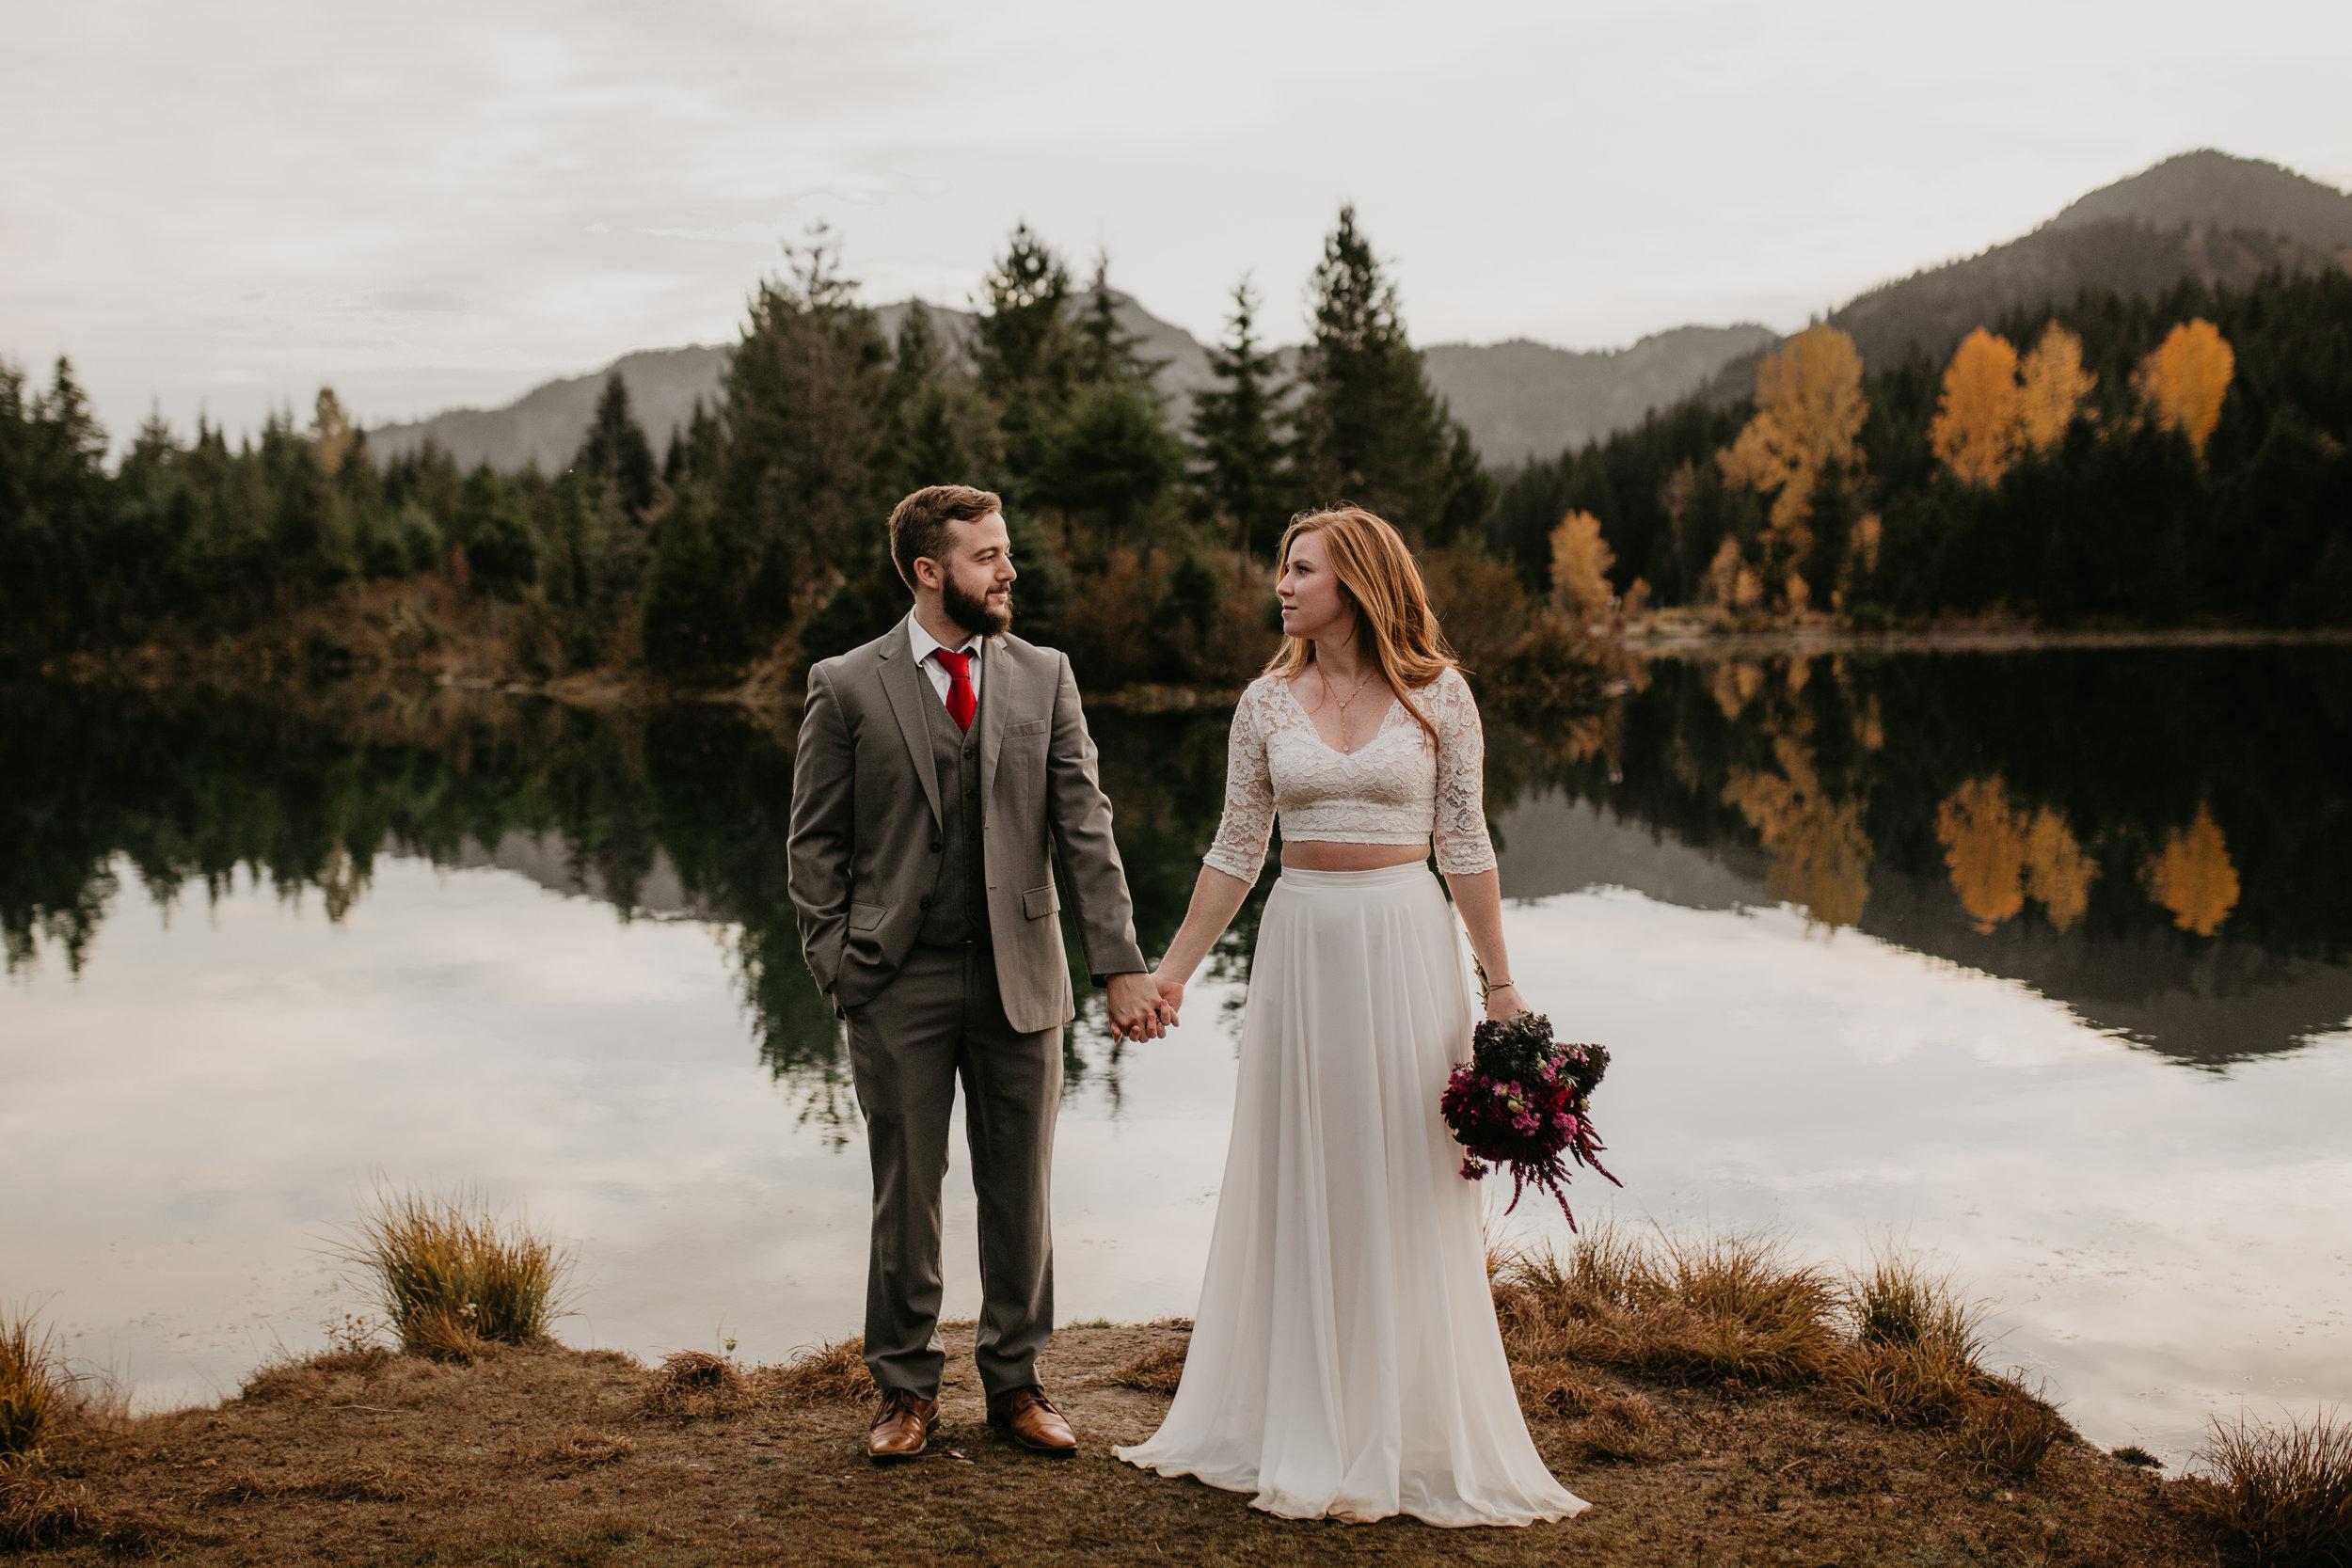 nicole-daacke-photography-mountain-view-elopement-at-gold-creek-pond-snoqualmie-washington-wa-elopement-photographer-photography-adventure-elopement-in-washington-fall-lakeside-golden-sunset-boho-fun-bride-0527.jpg